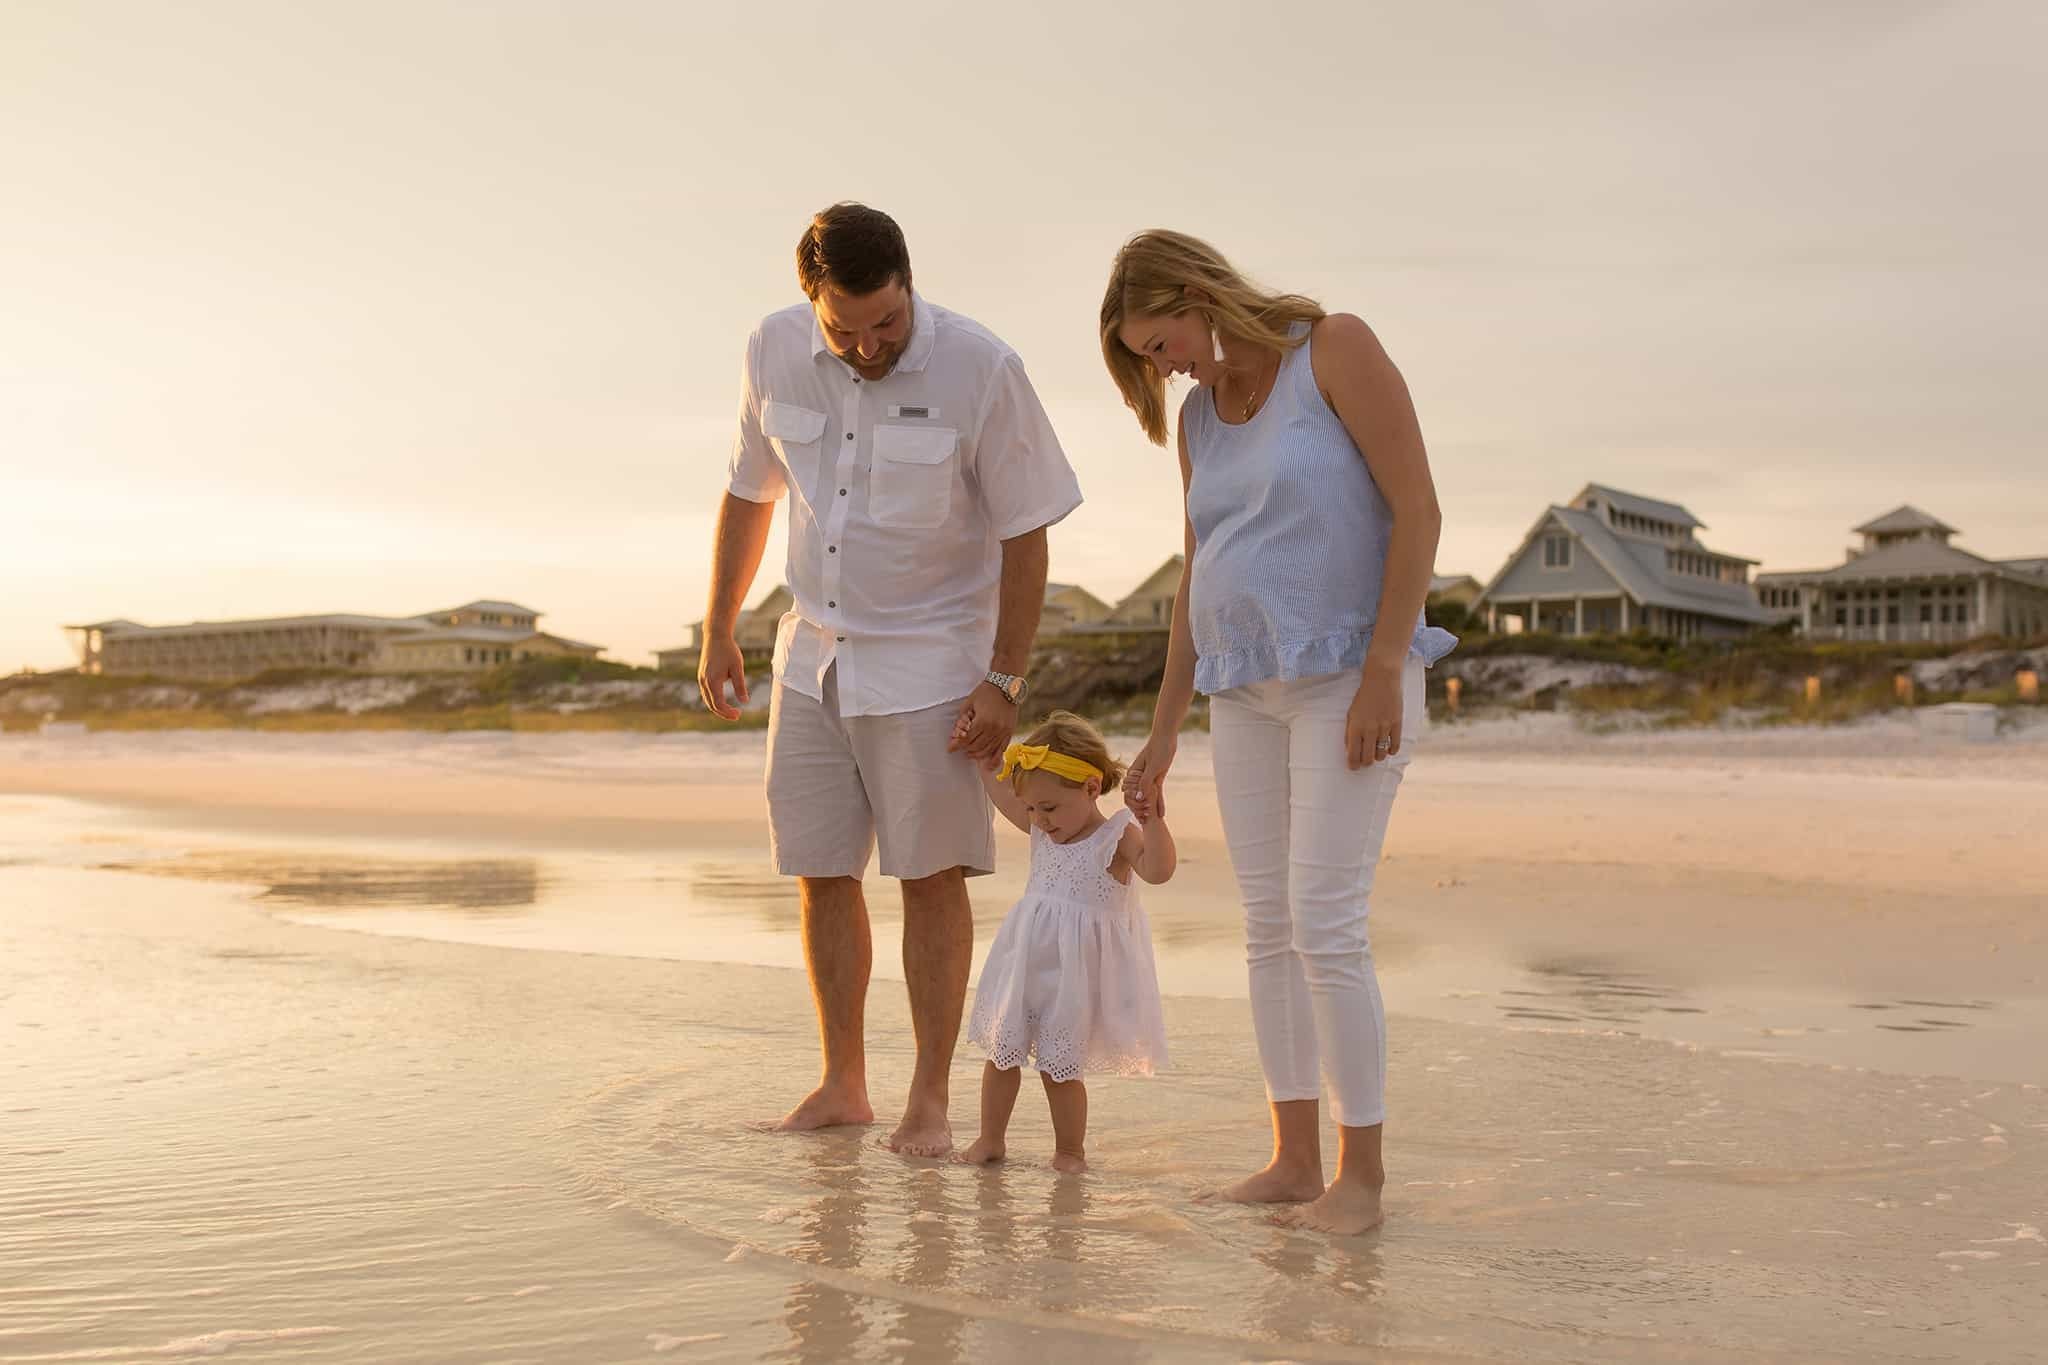 Panama City Beach Lifestyle Photographer - LJennings